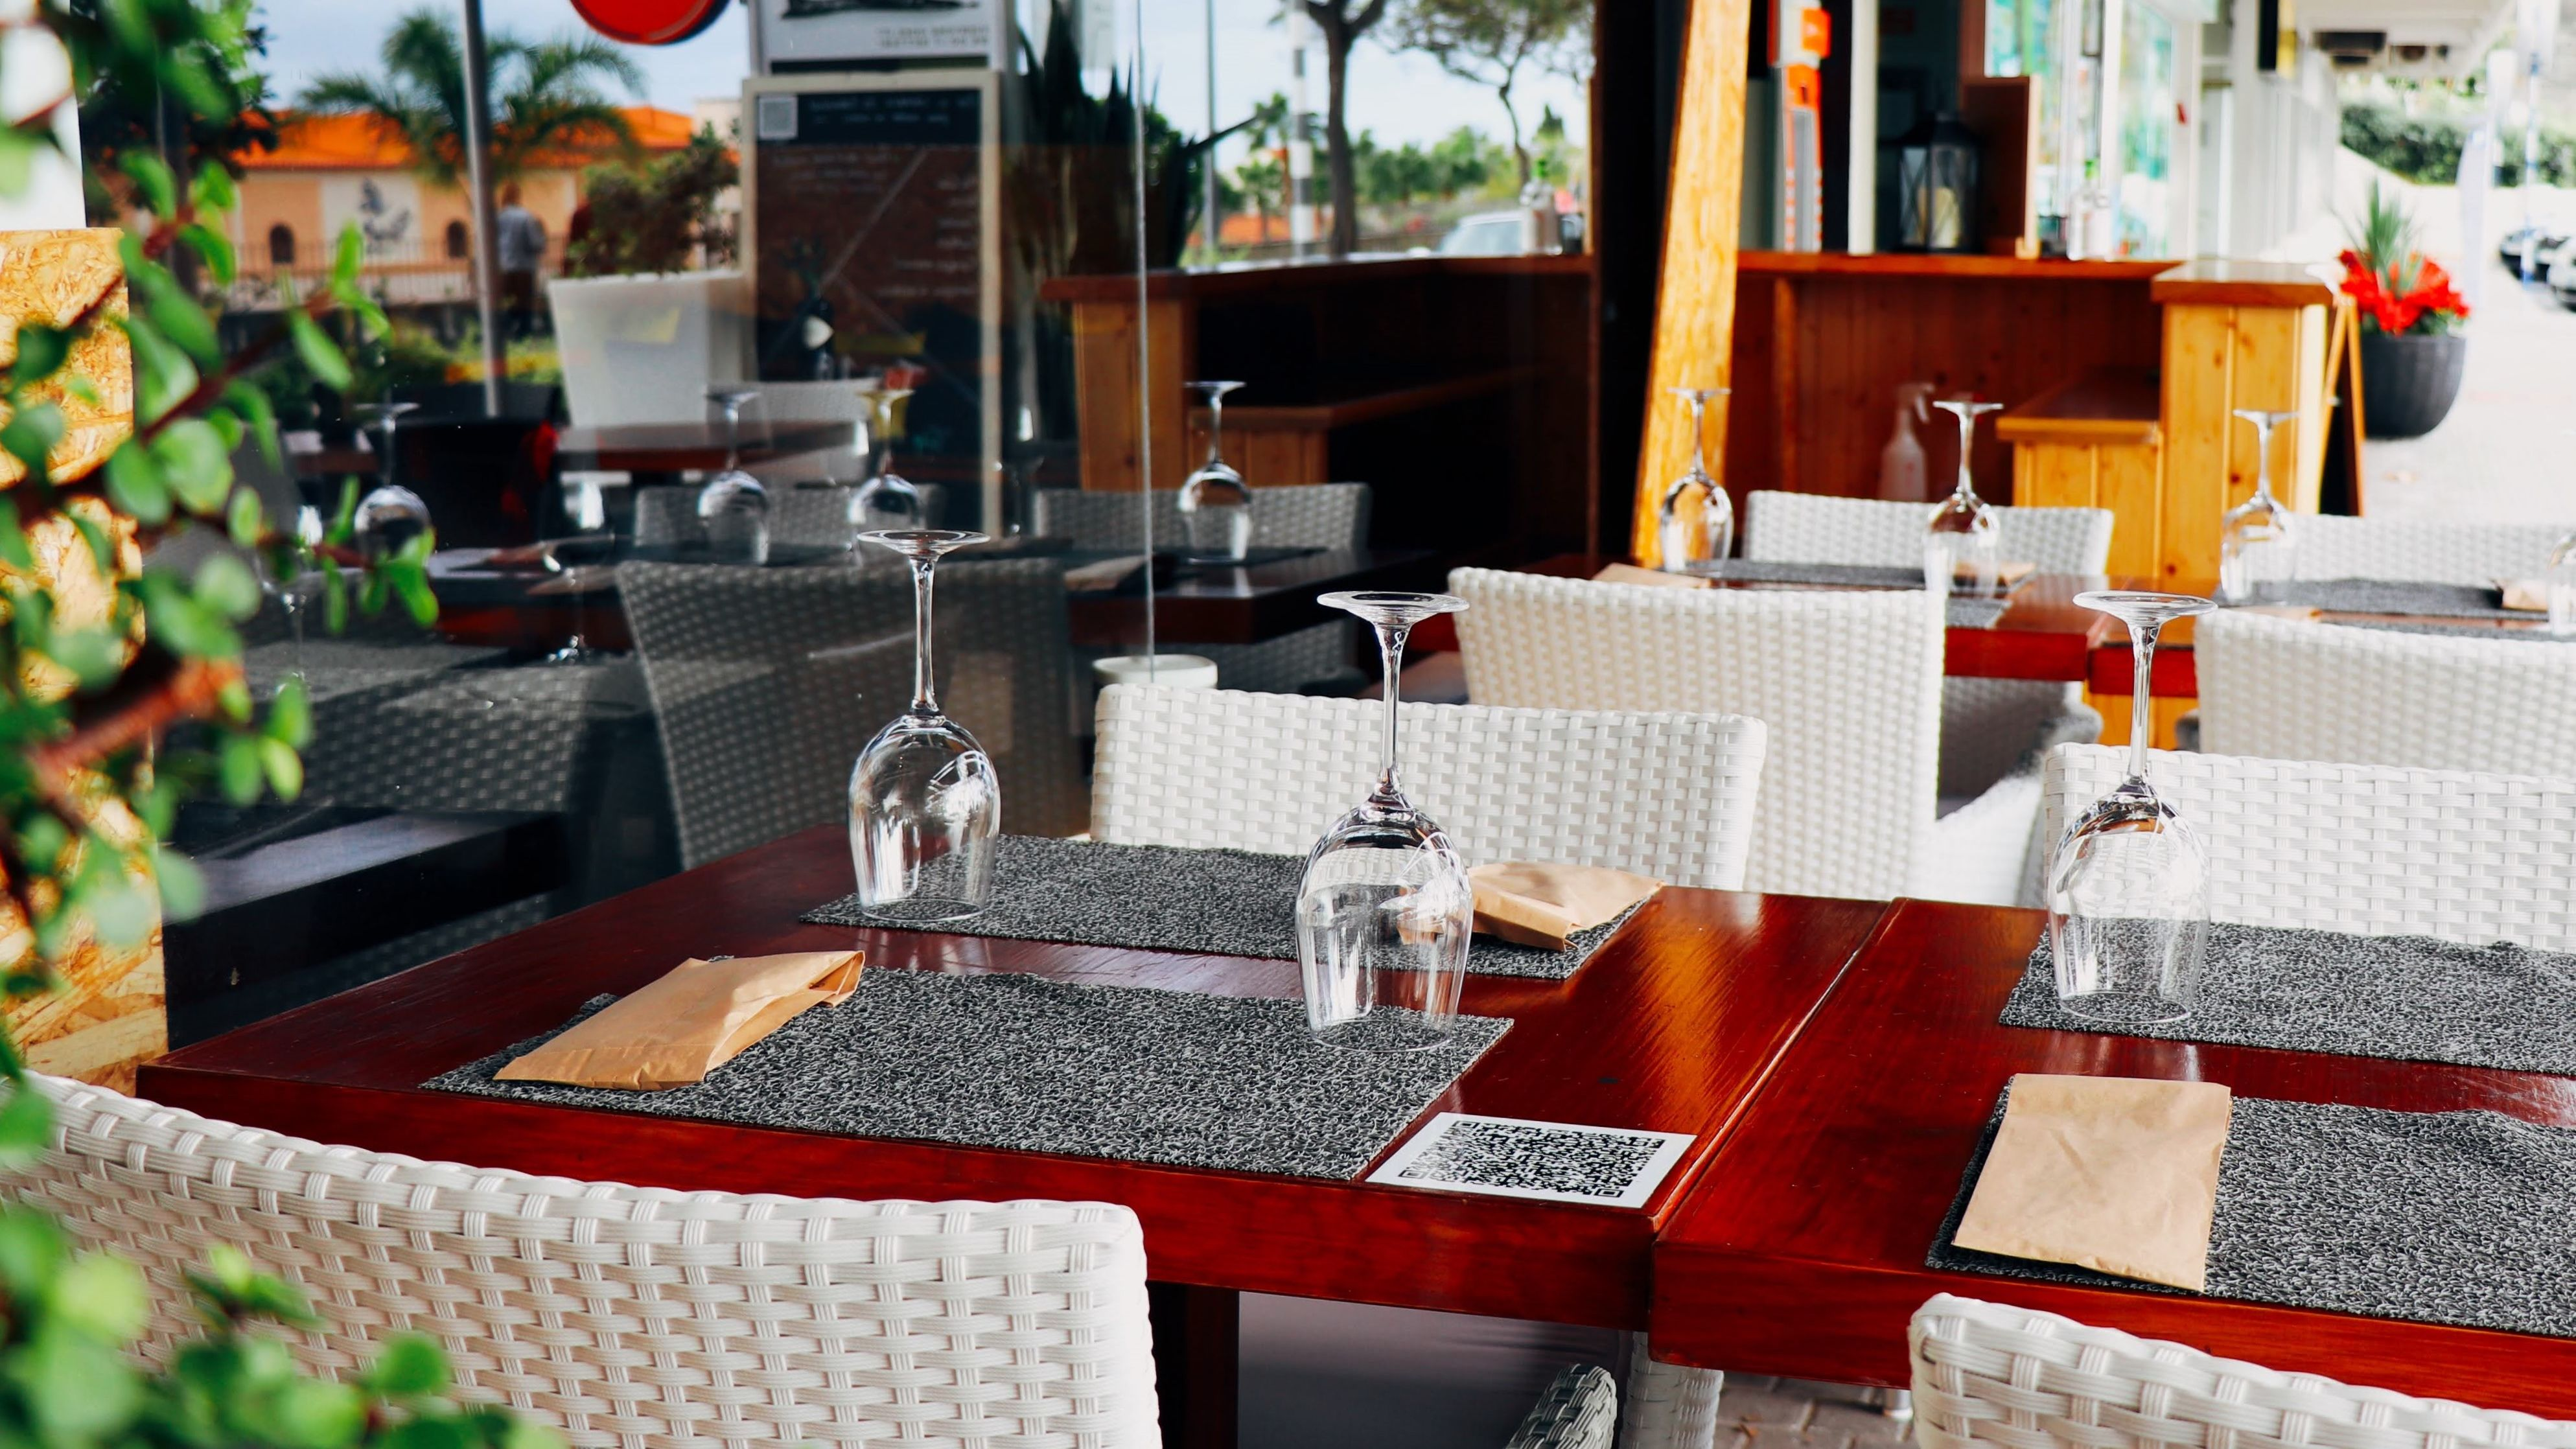 IlhaKaffé - Tap Room & Dining